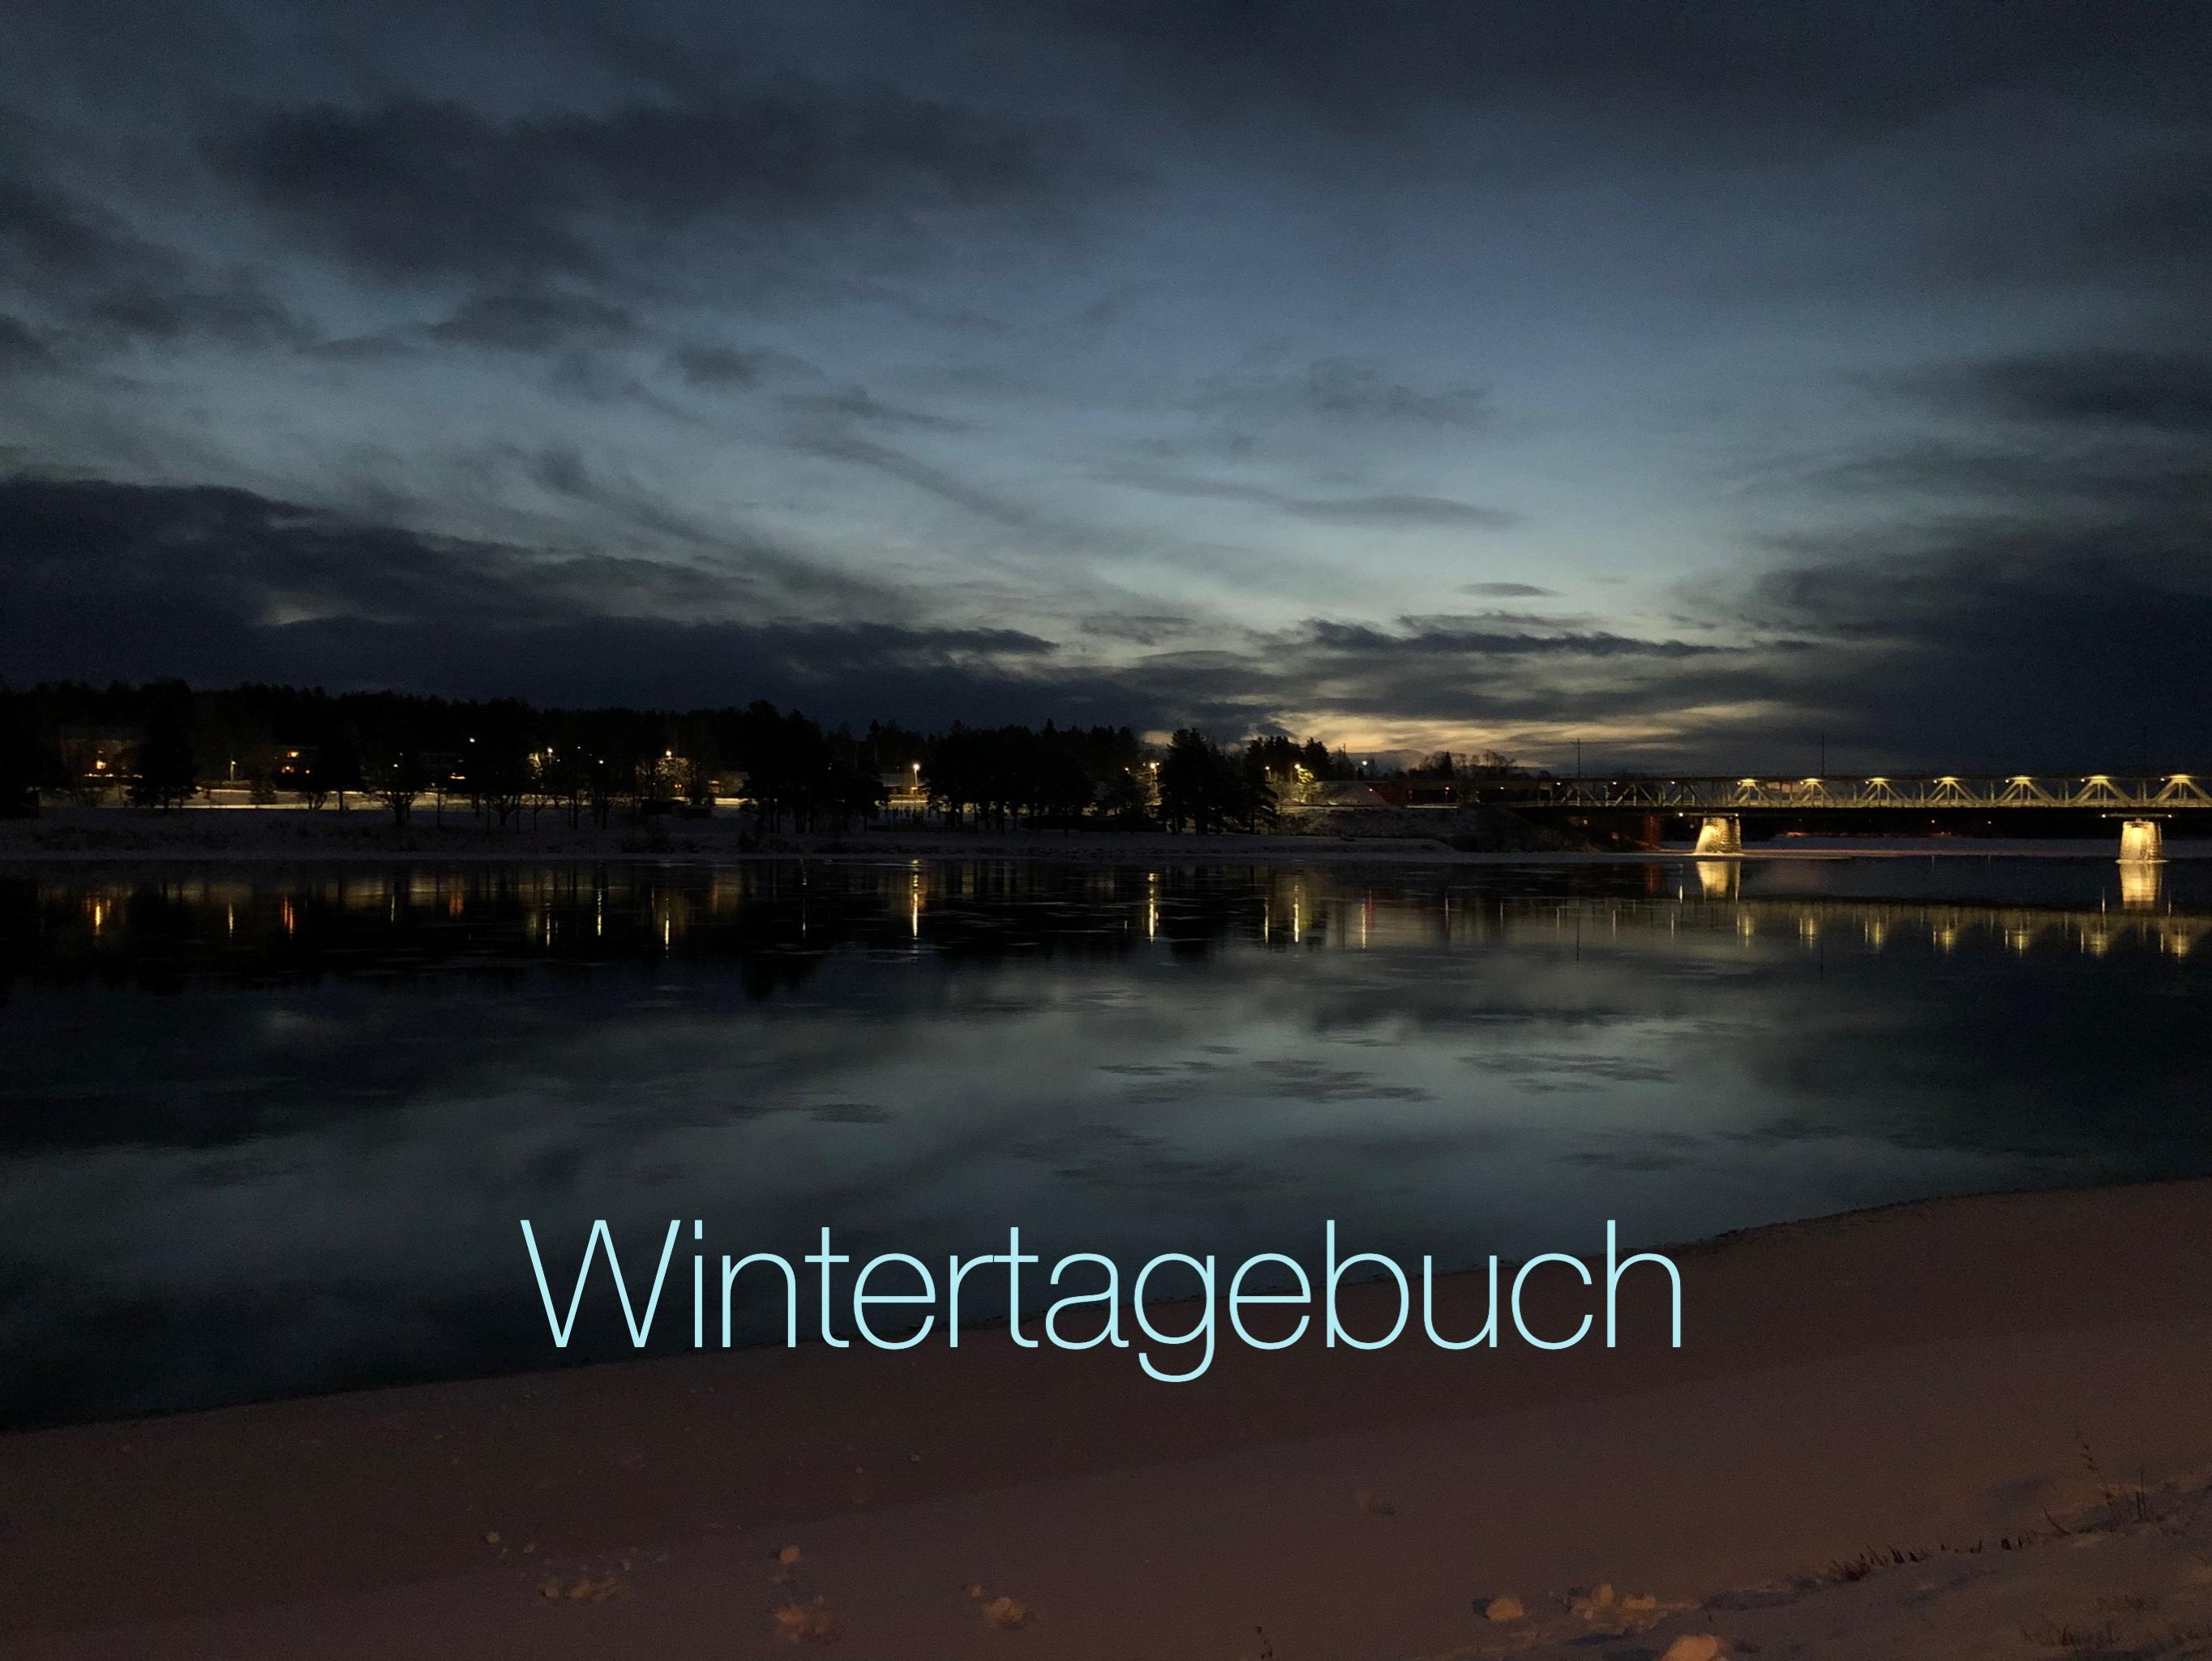 Wintertagebuch 4: Polarnachtfazit